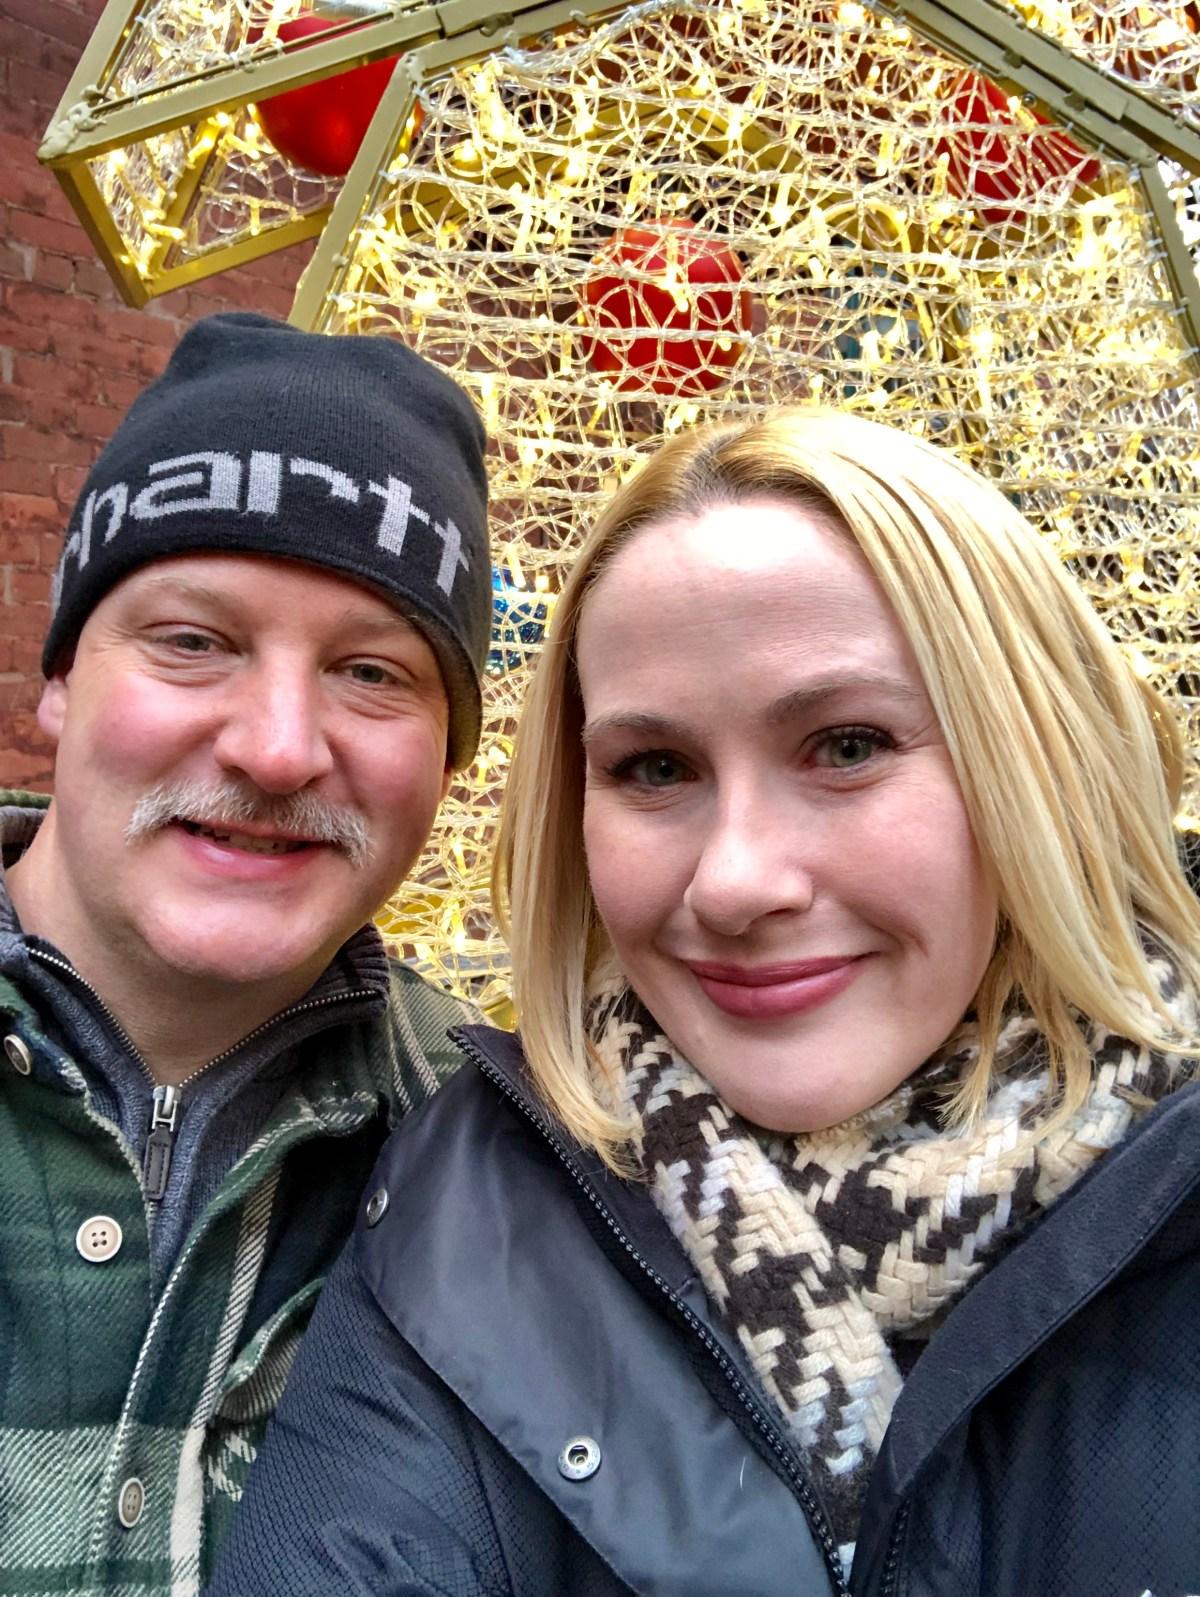 Happylifeblogspot at the Toronto Christmas Market #torontochristmasmarket #toronto #distillerydistrict #ontario #christmasmarkets #canada